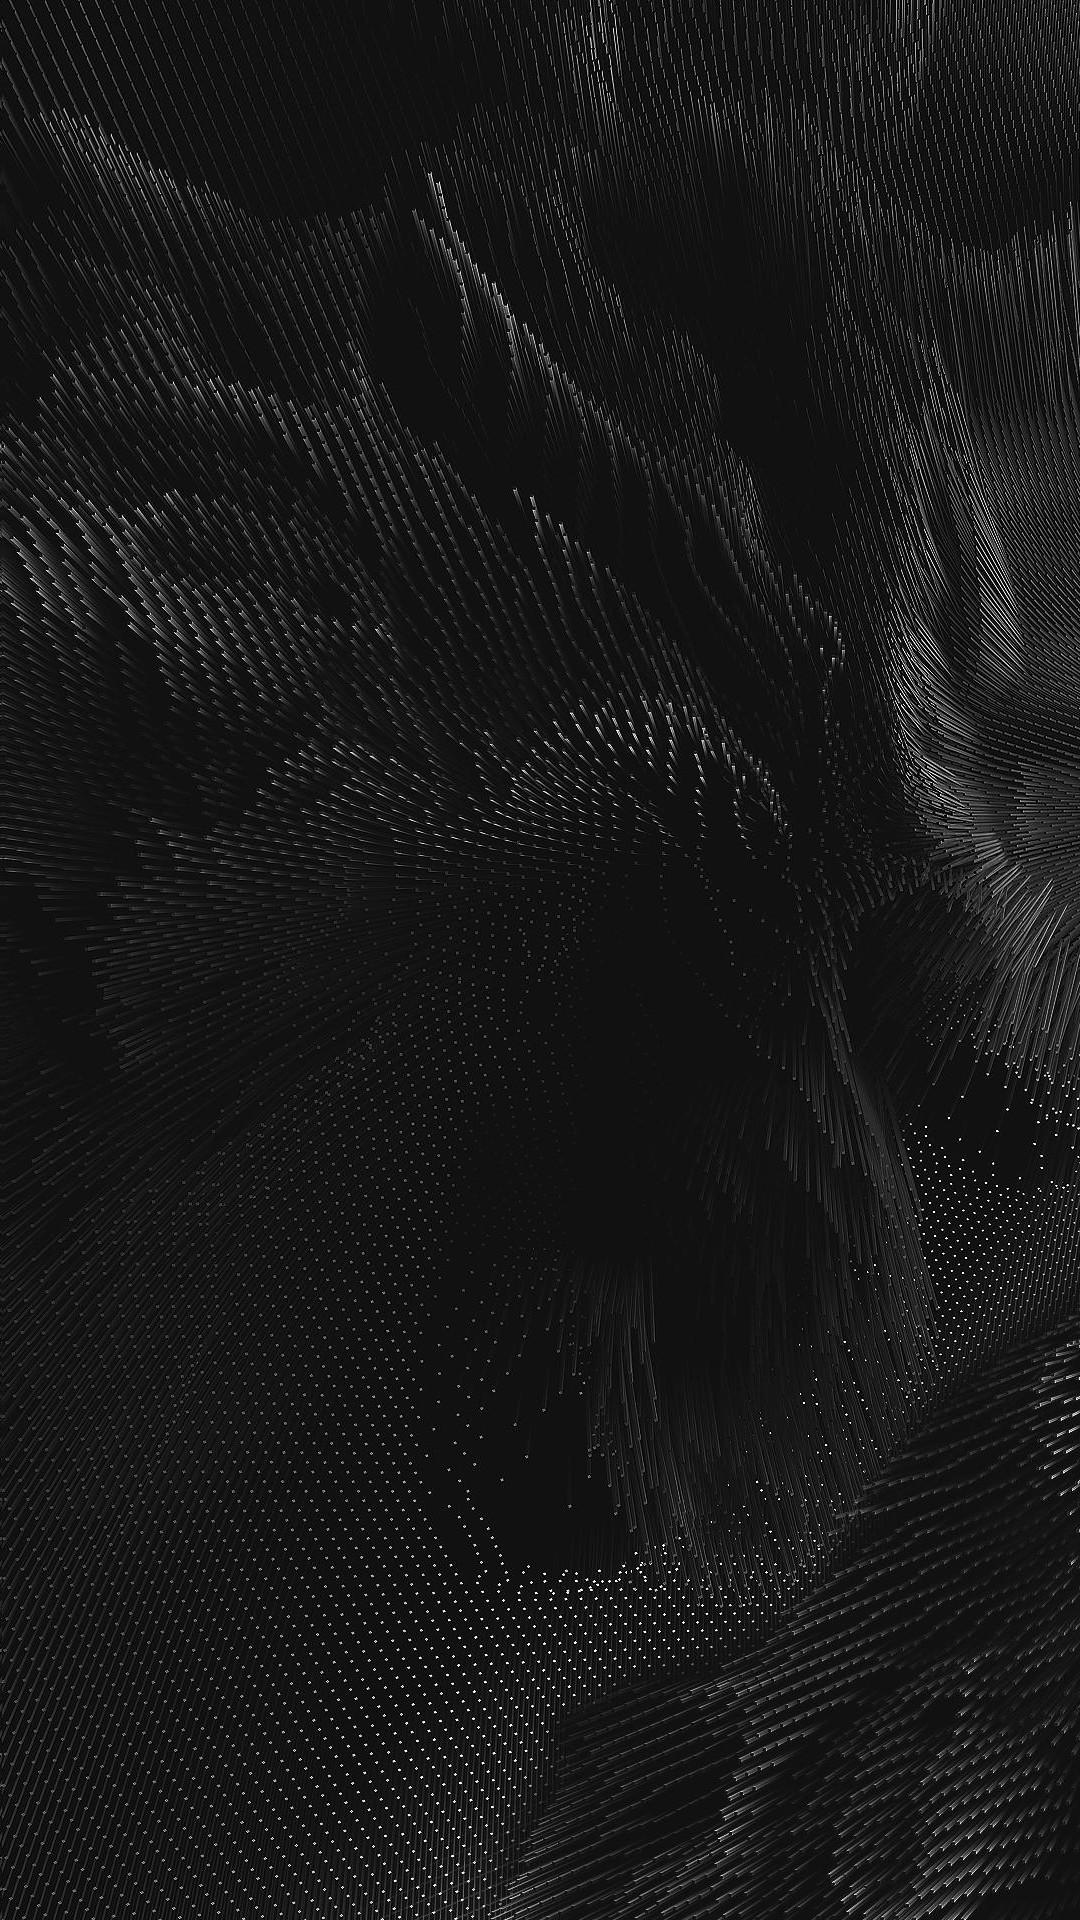 Dark Images Wallpaper (72+ pictures)